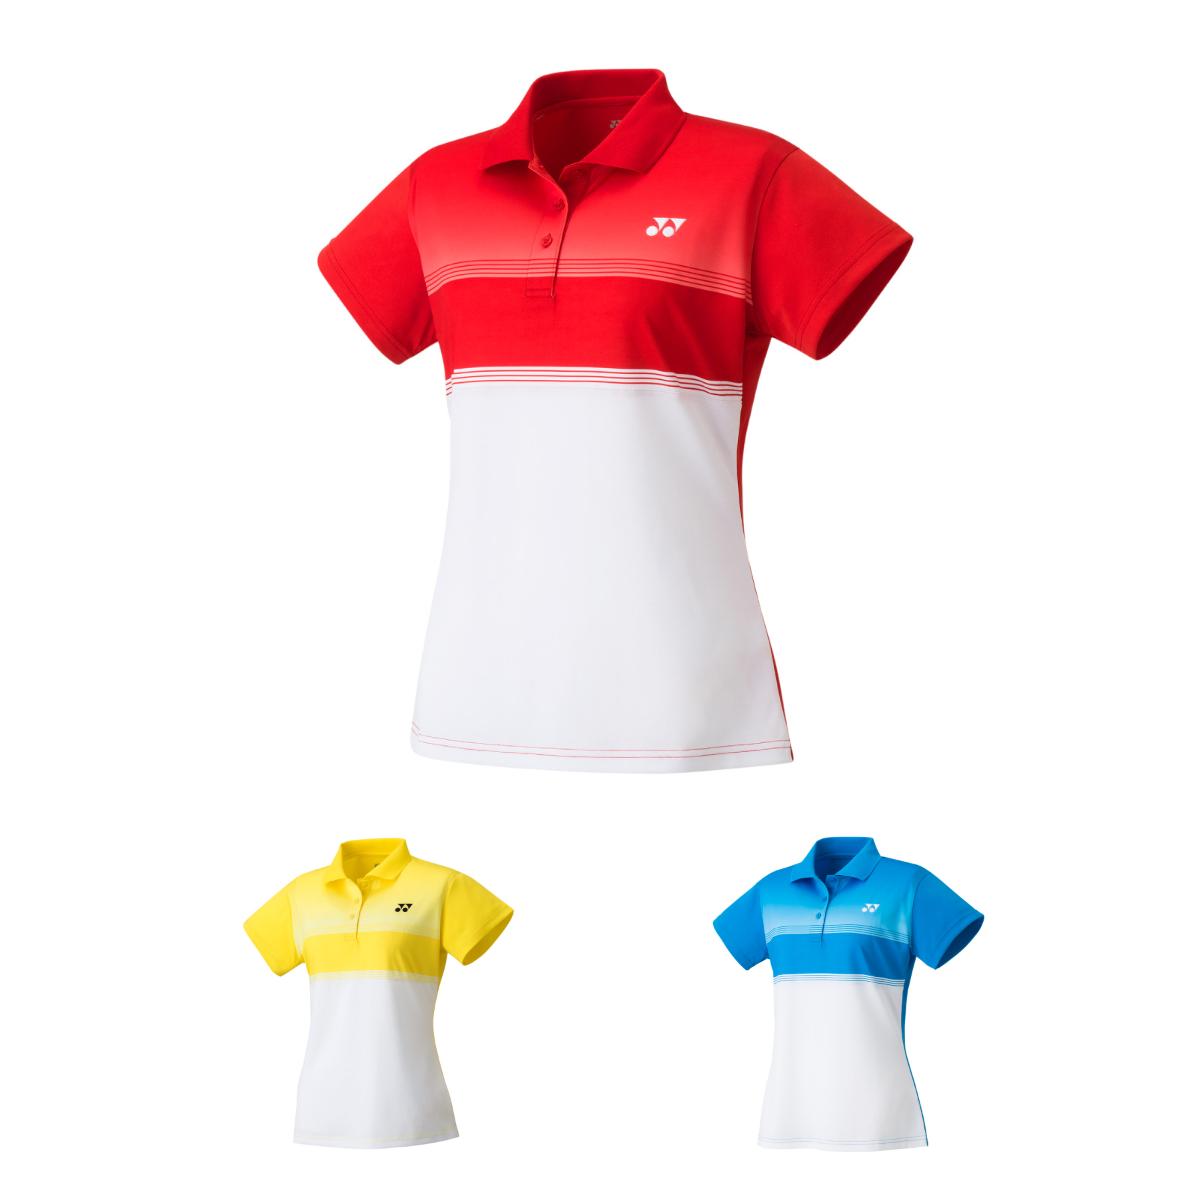 YONEX - Women Polo Shirt, Club Team YW0019Detailbild - 0